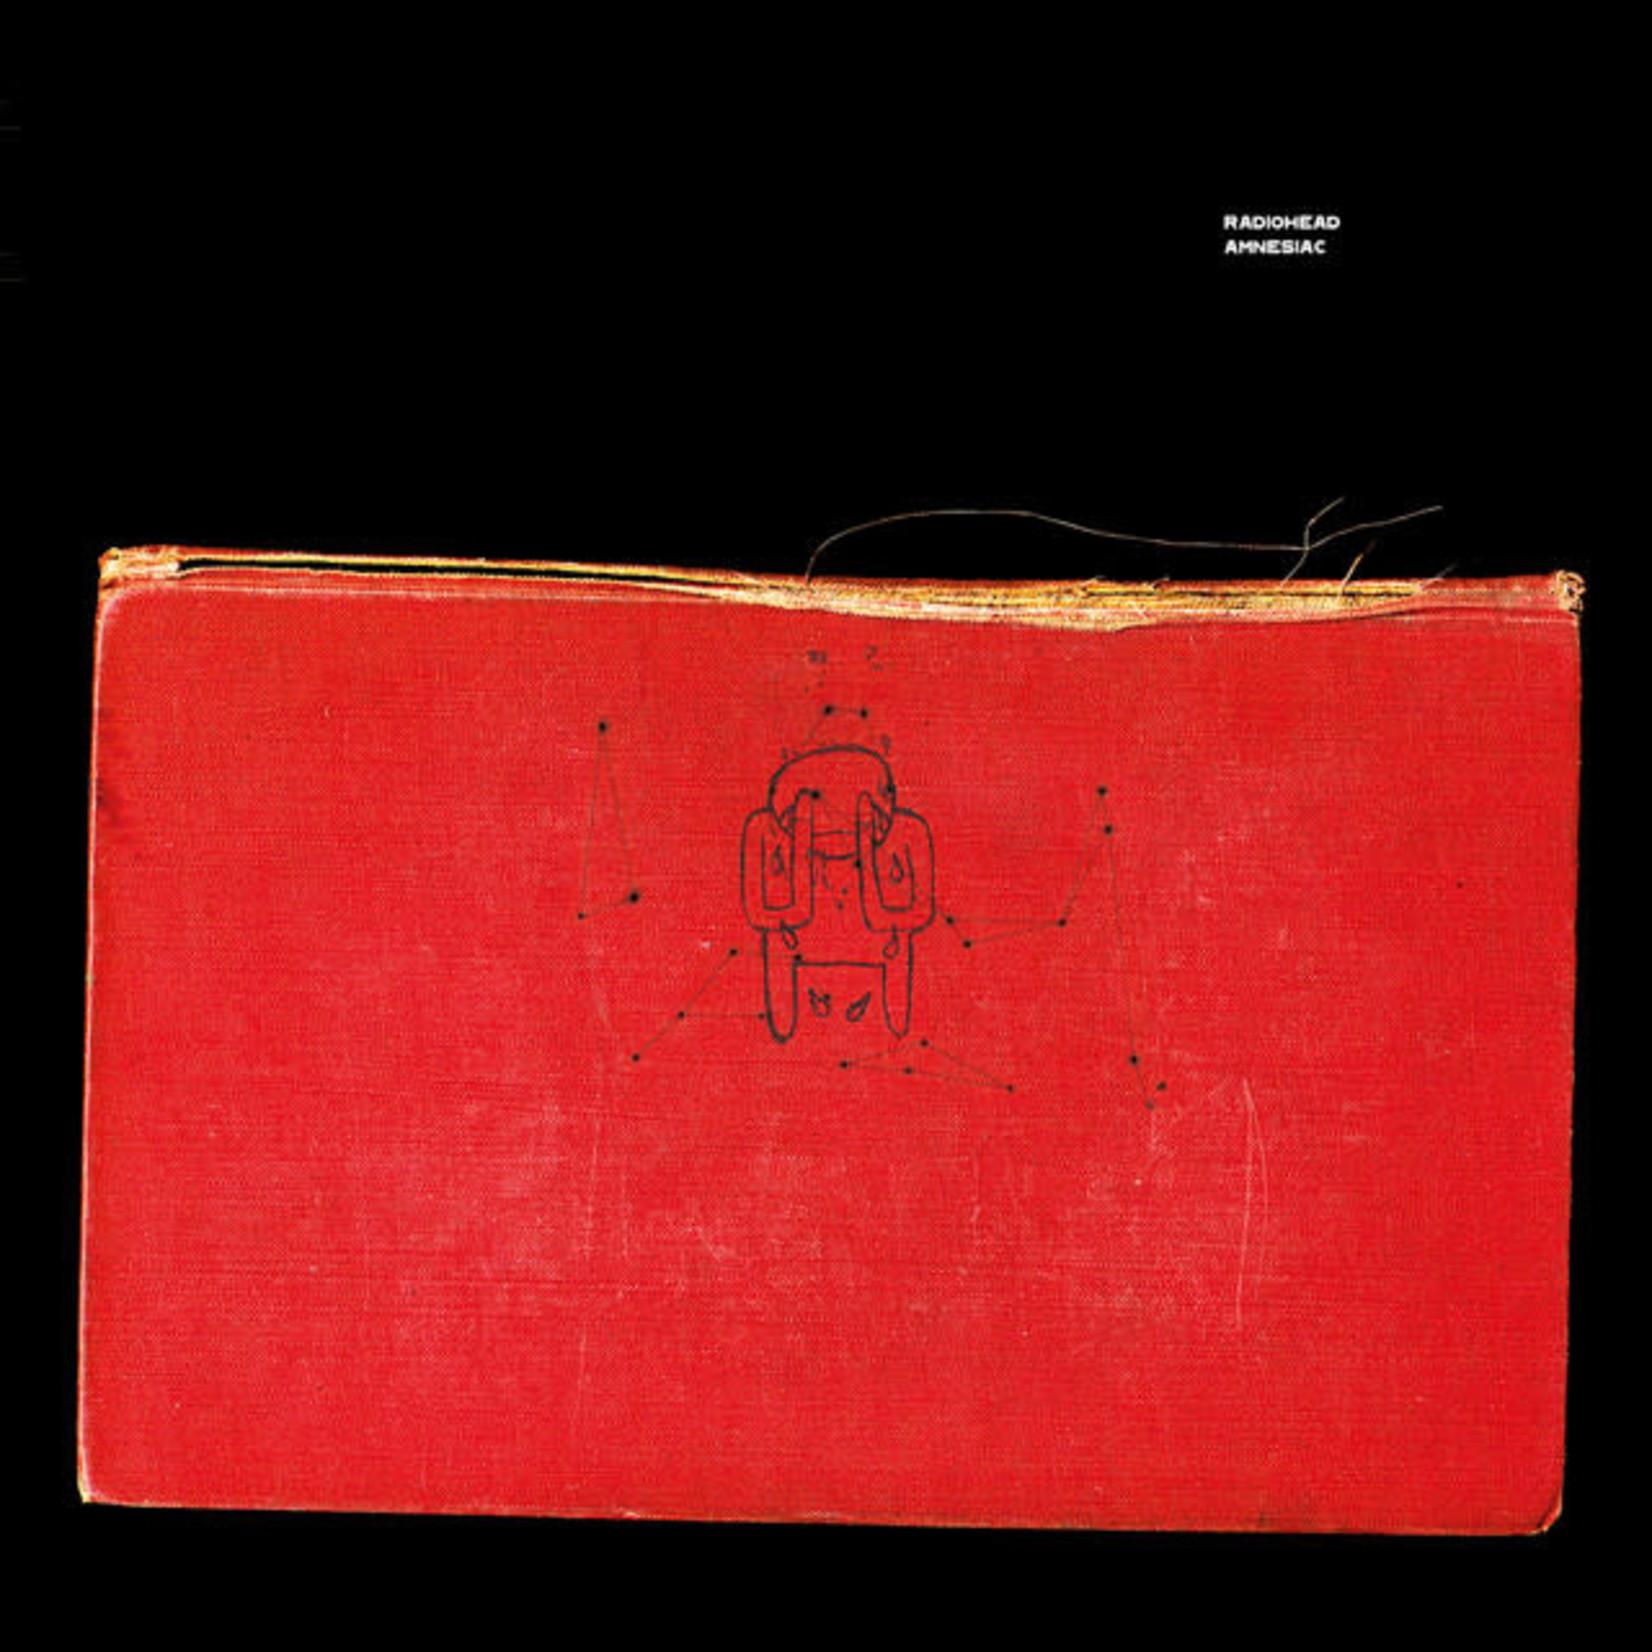 Vinyl Radiohead - Amnesiac